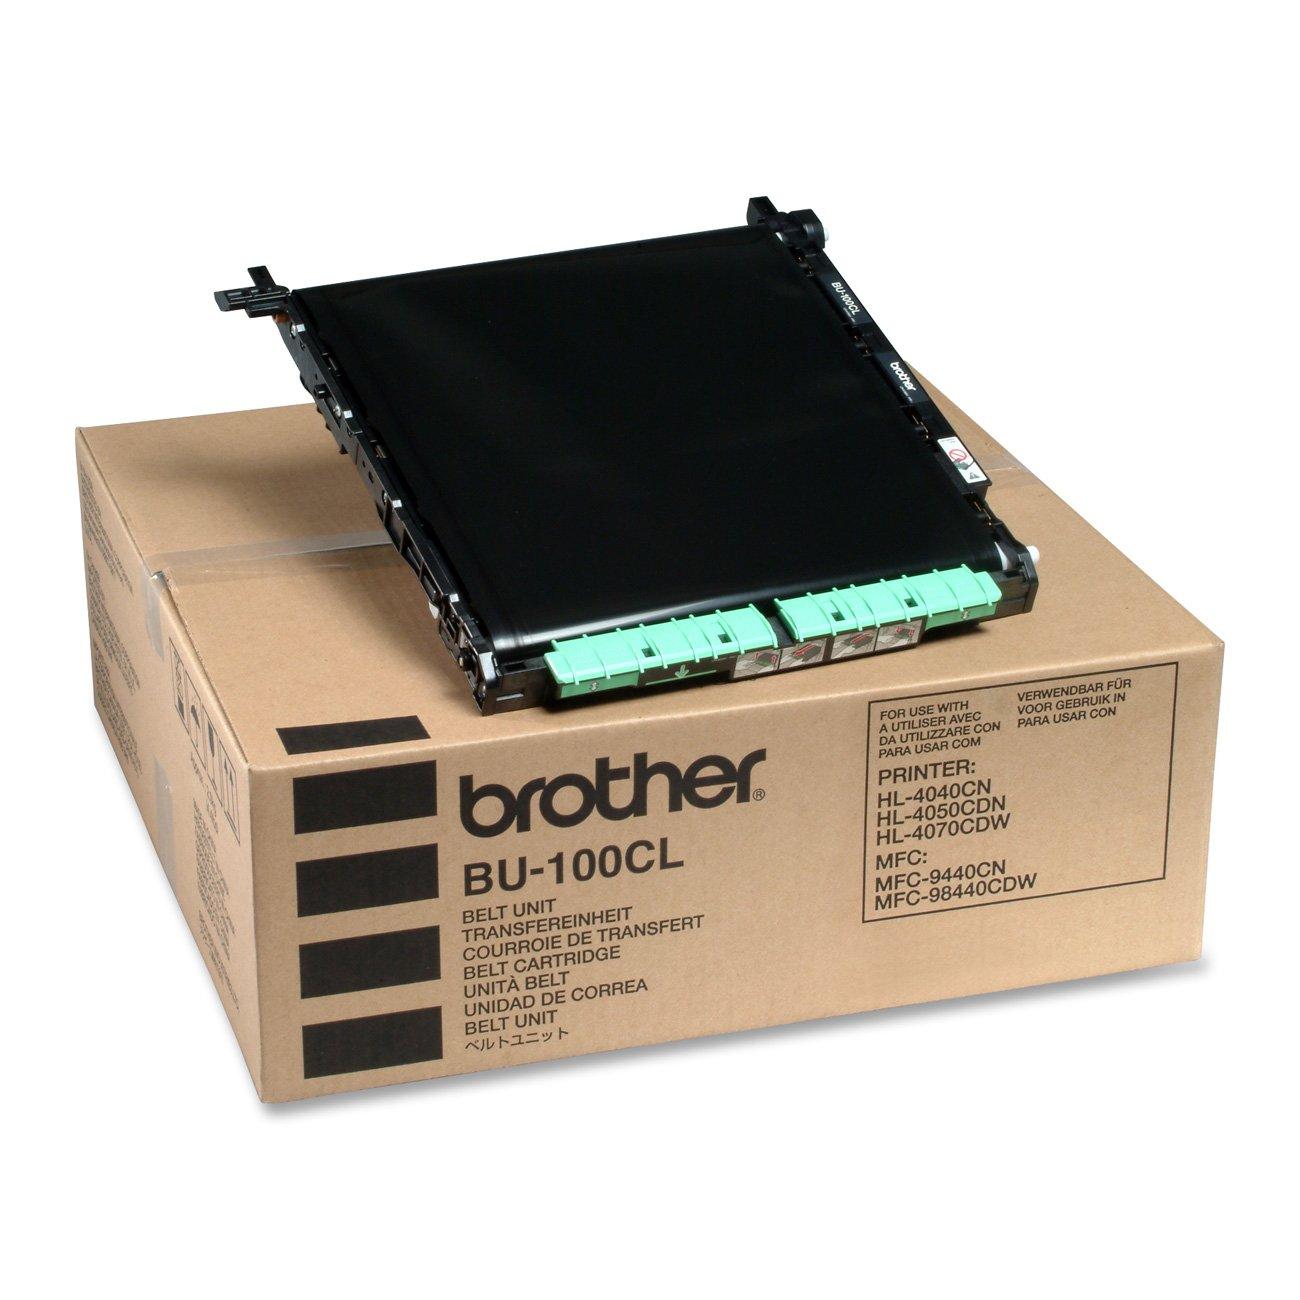 Brother BU-100CL Belt Unit for HL-4040CN, HL-4070CDW Series - Retail Packaging